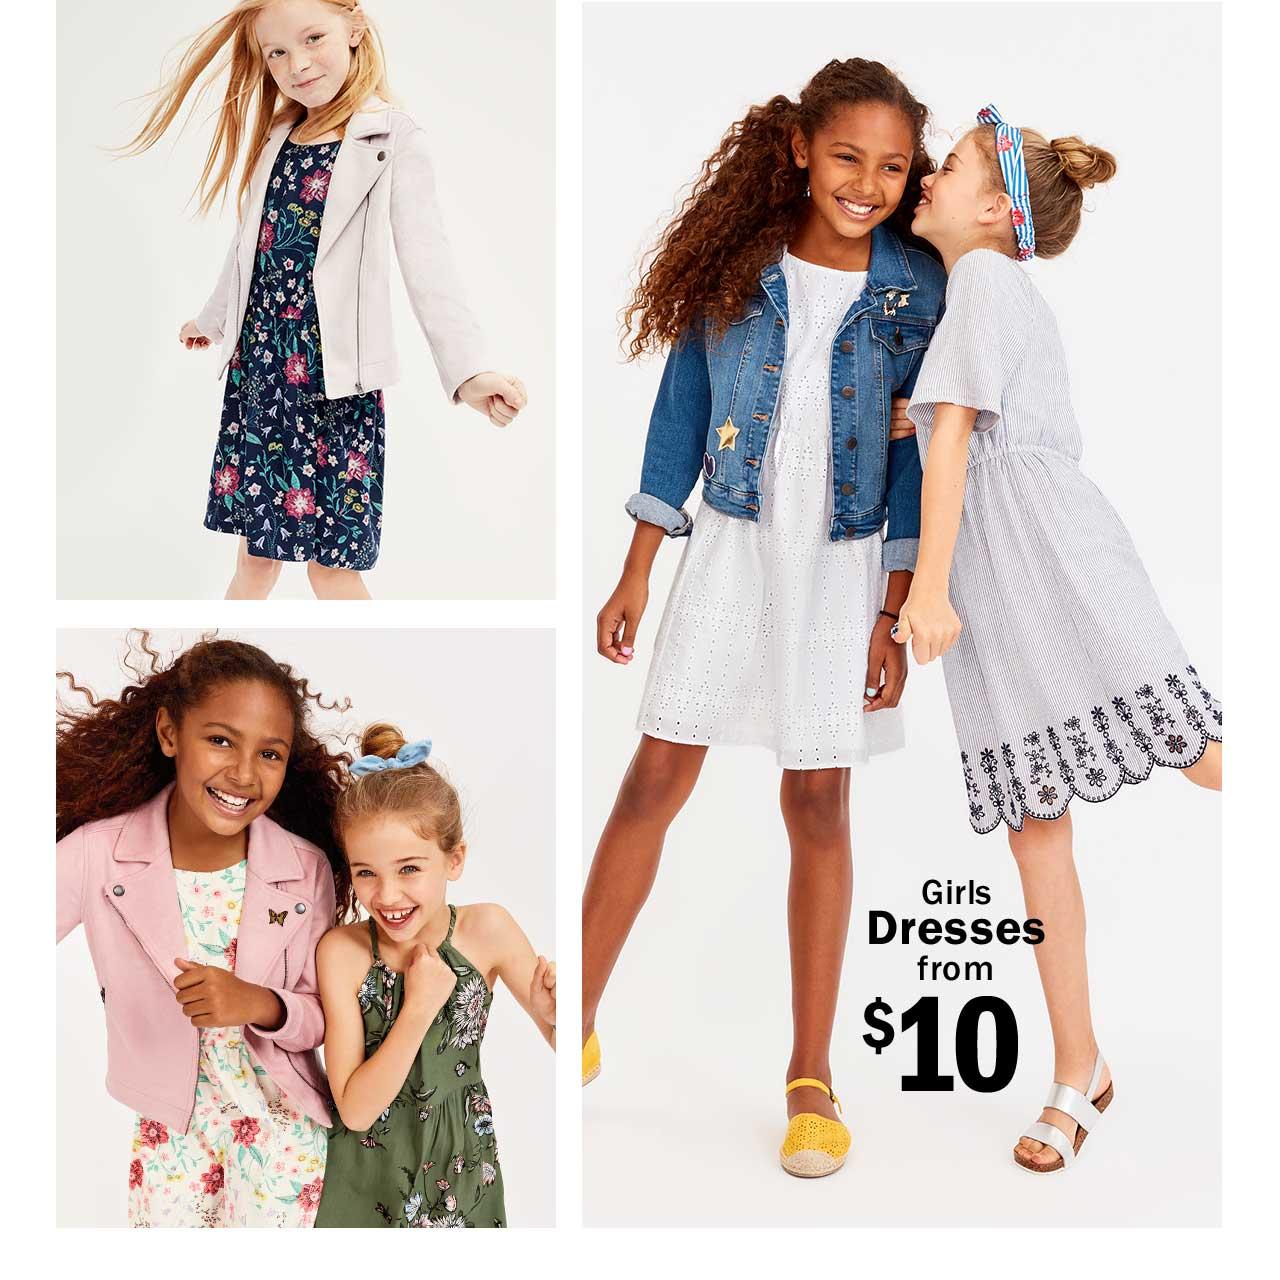 Girls Dresses from $10